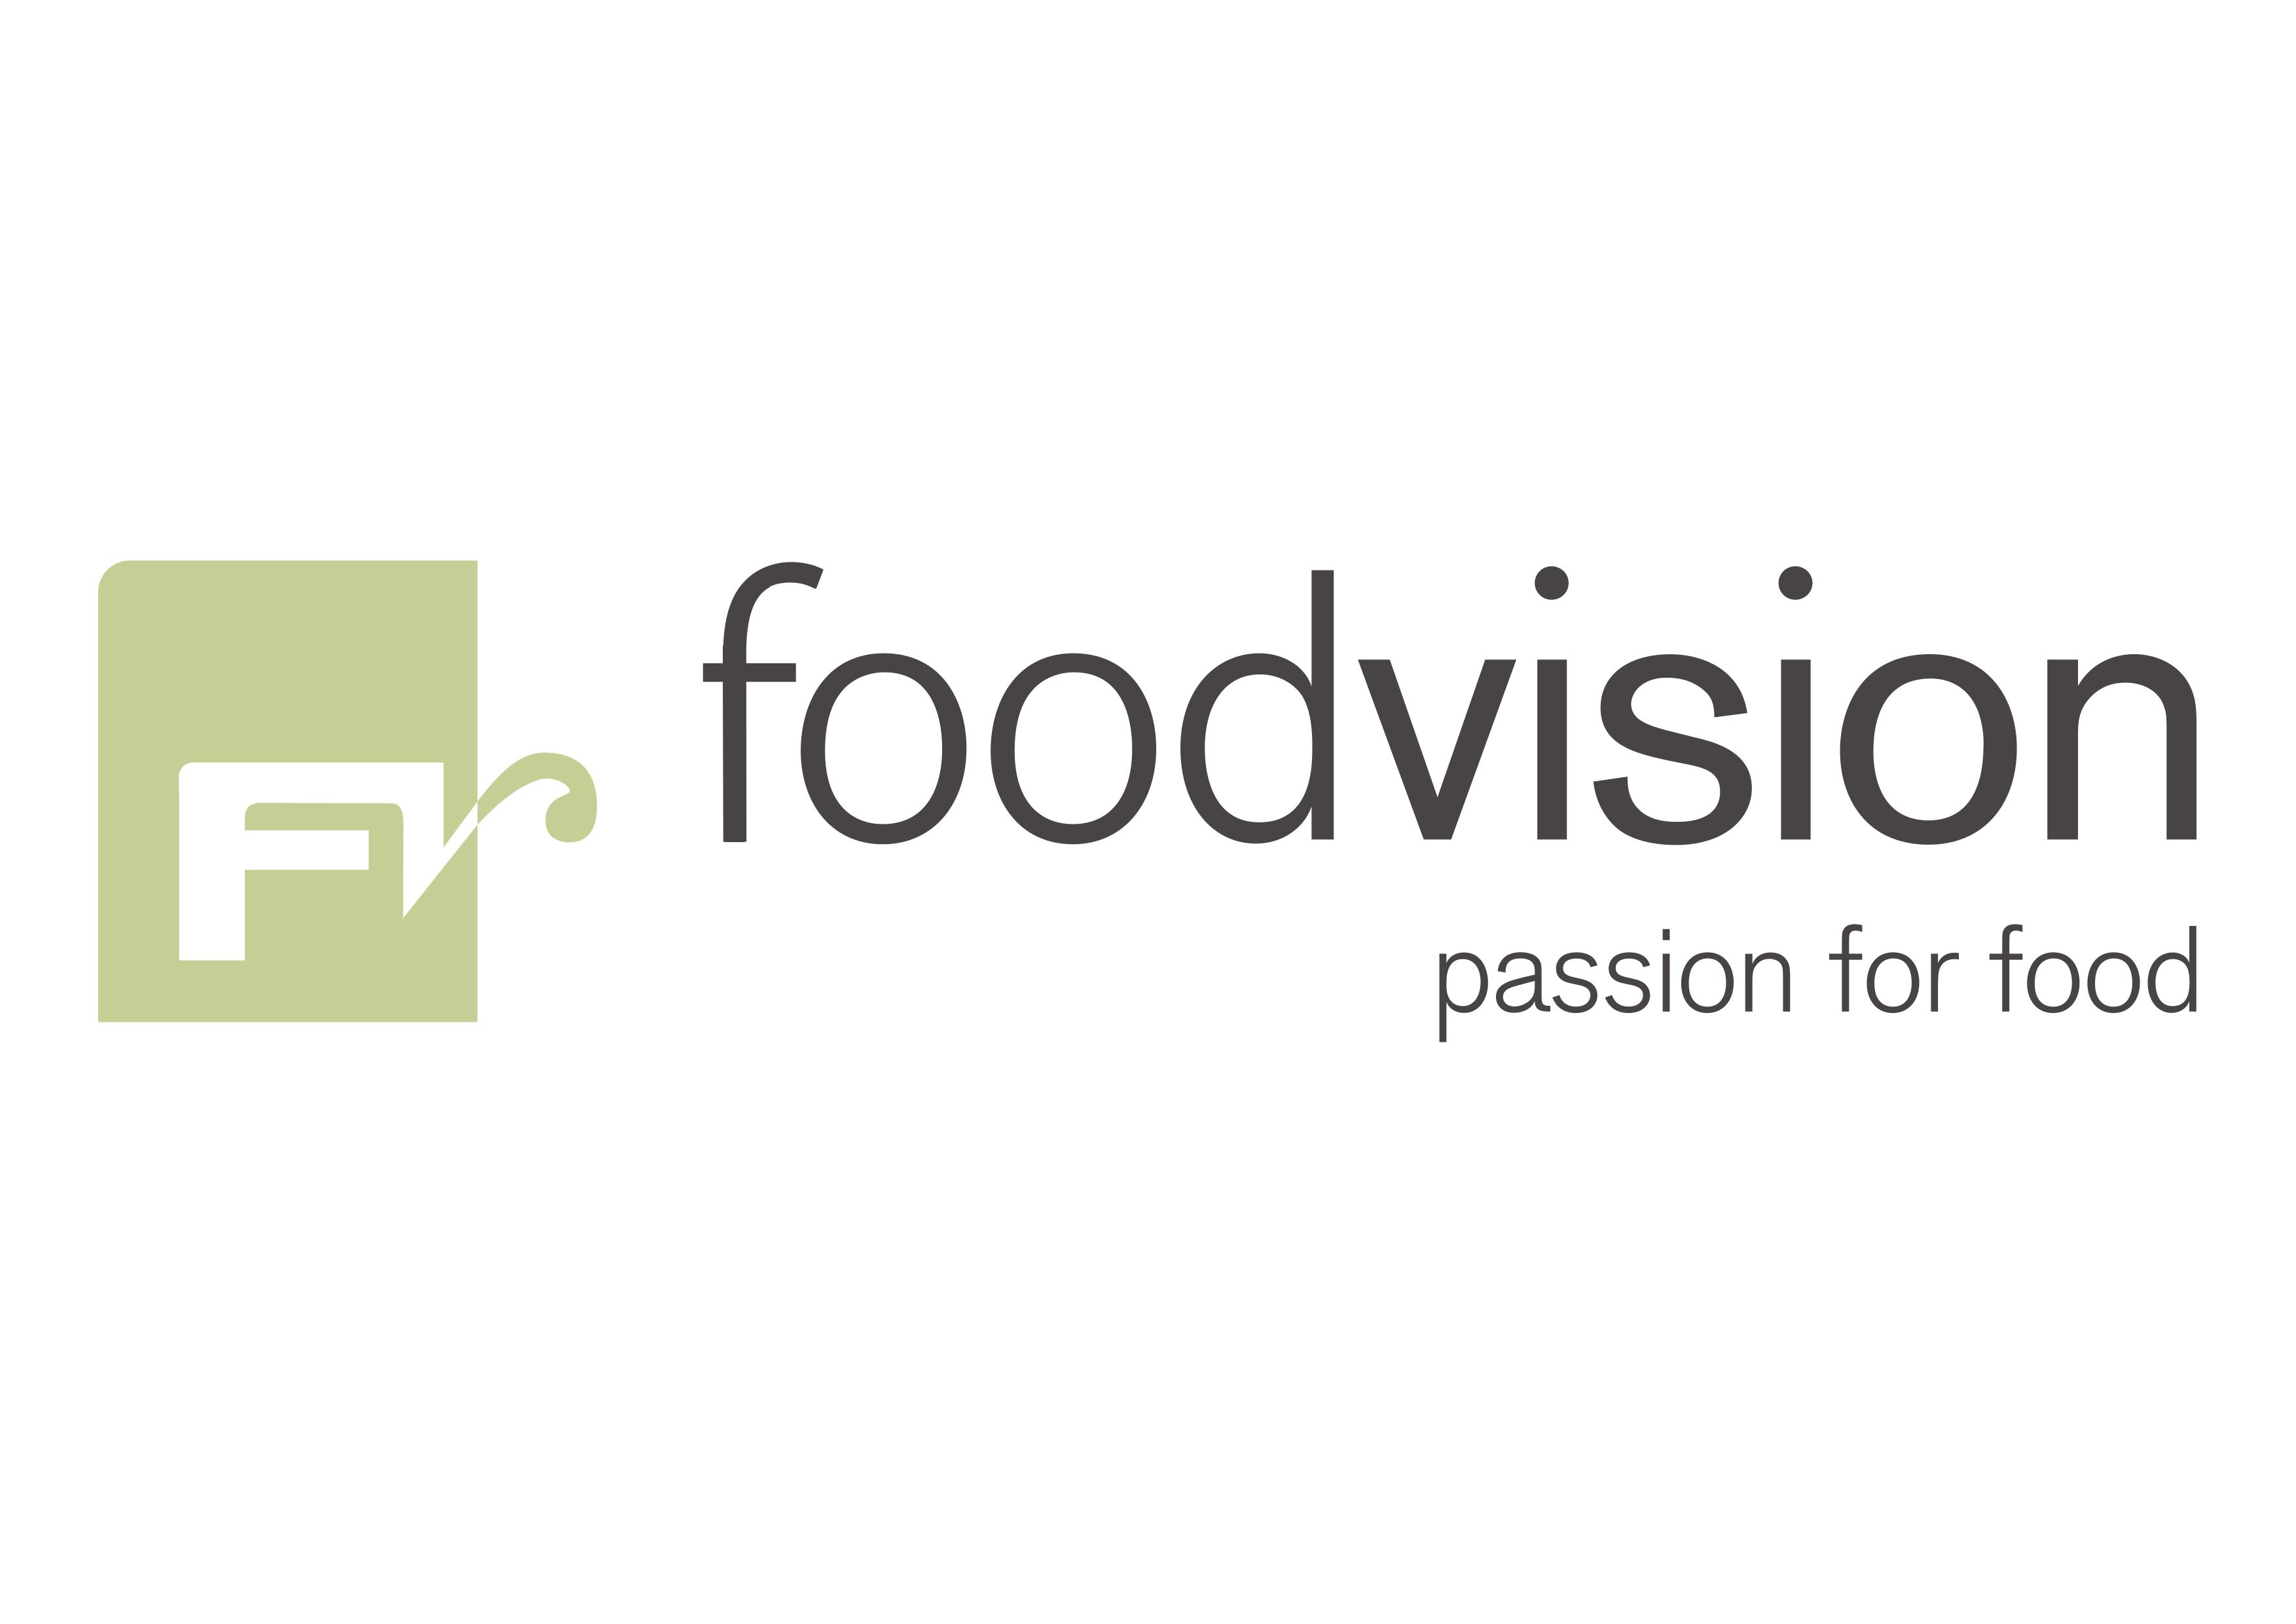 JPEG Foodvision logo